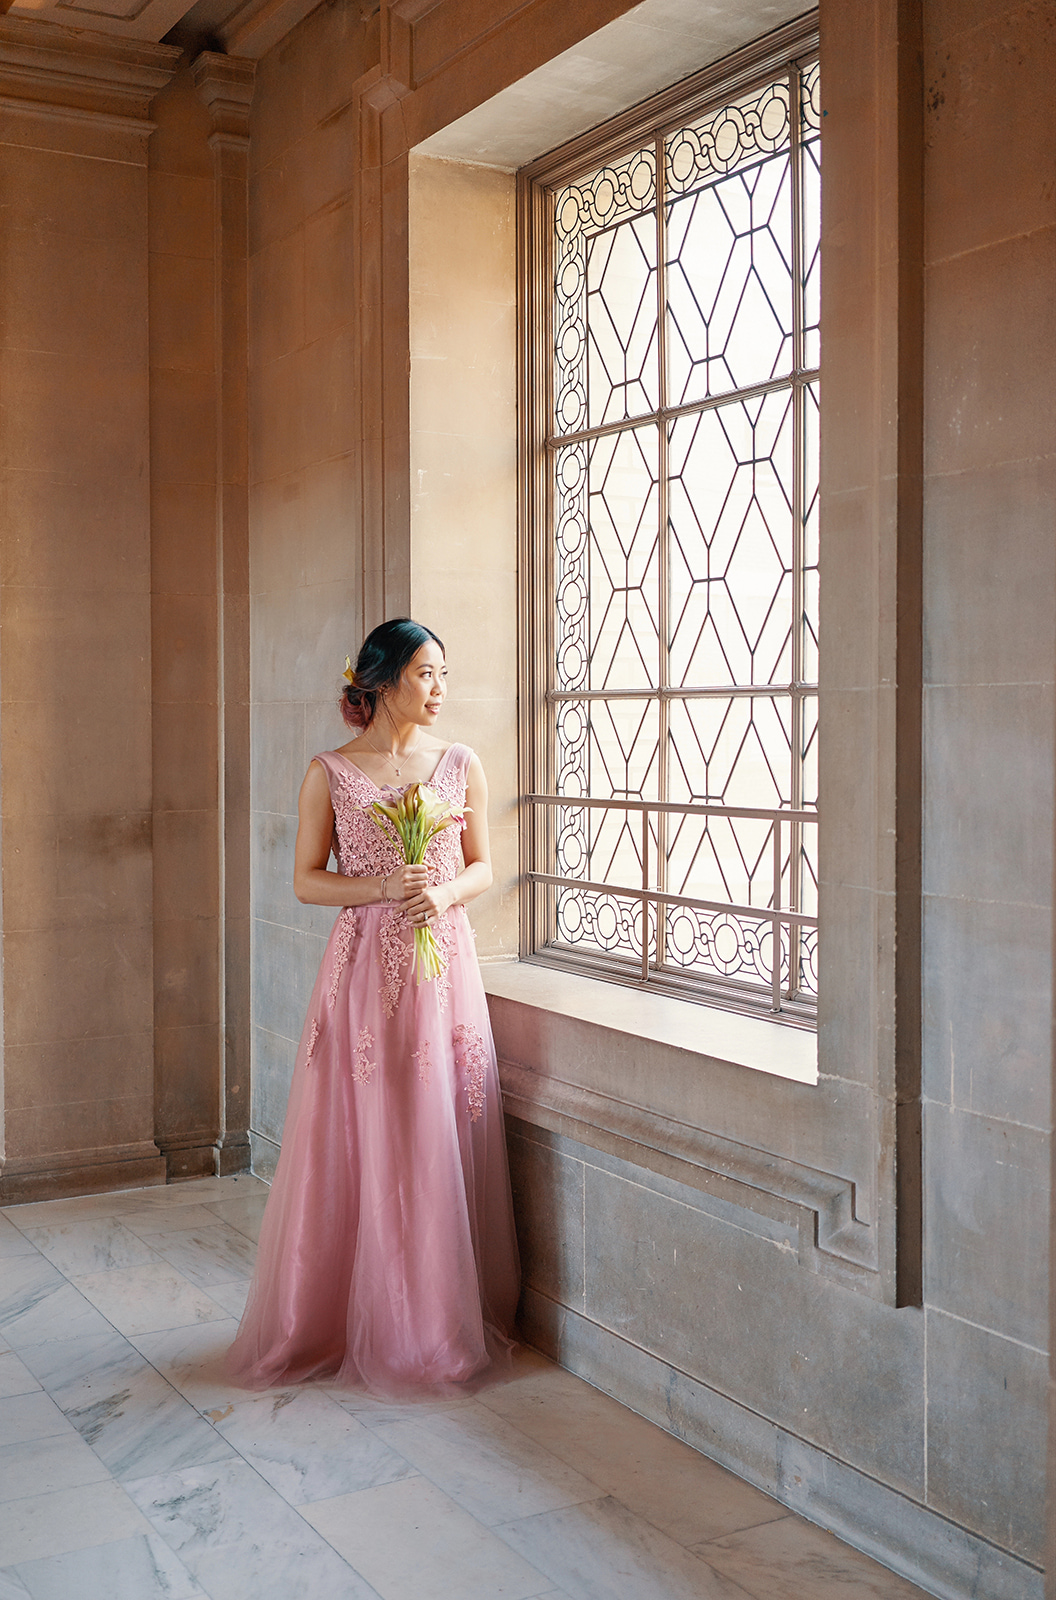 sf-city-hall-bridal-photo-session-afewgoodclicks.jpg